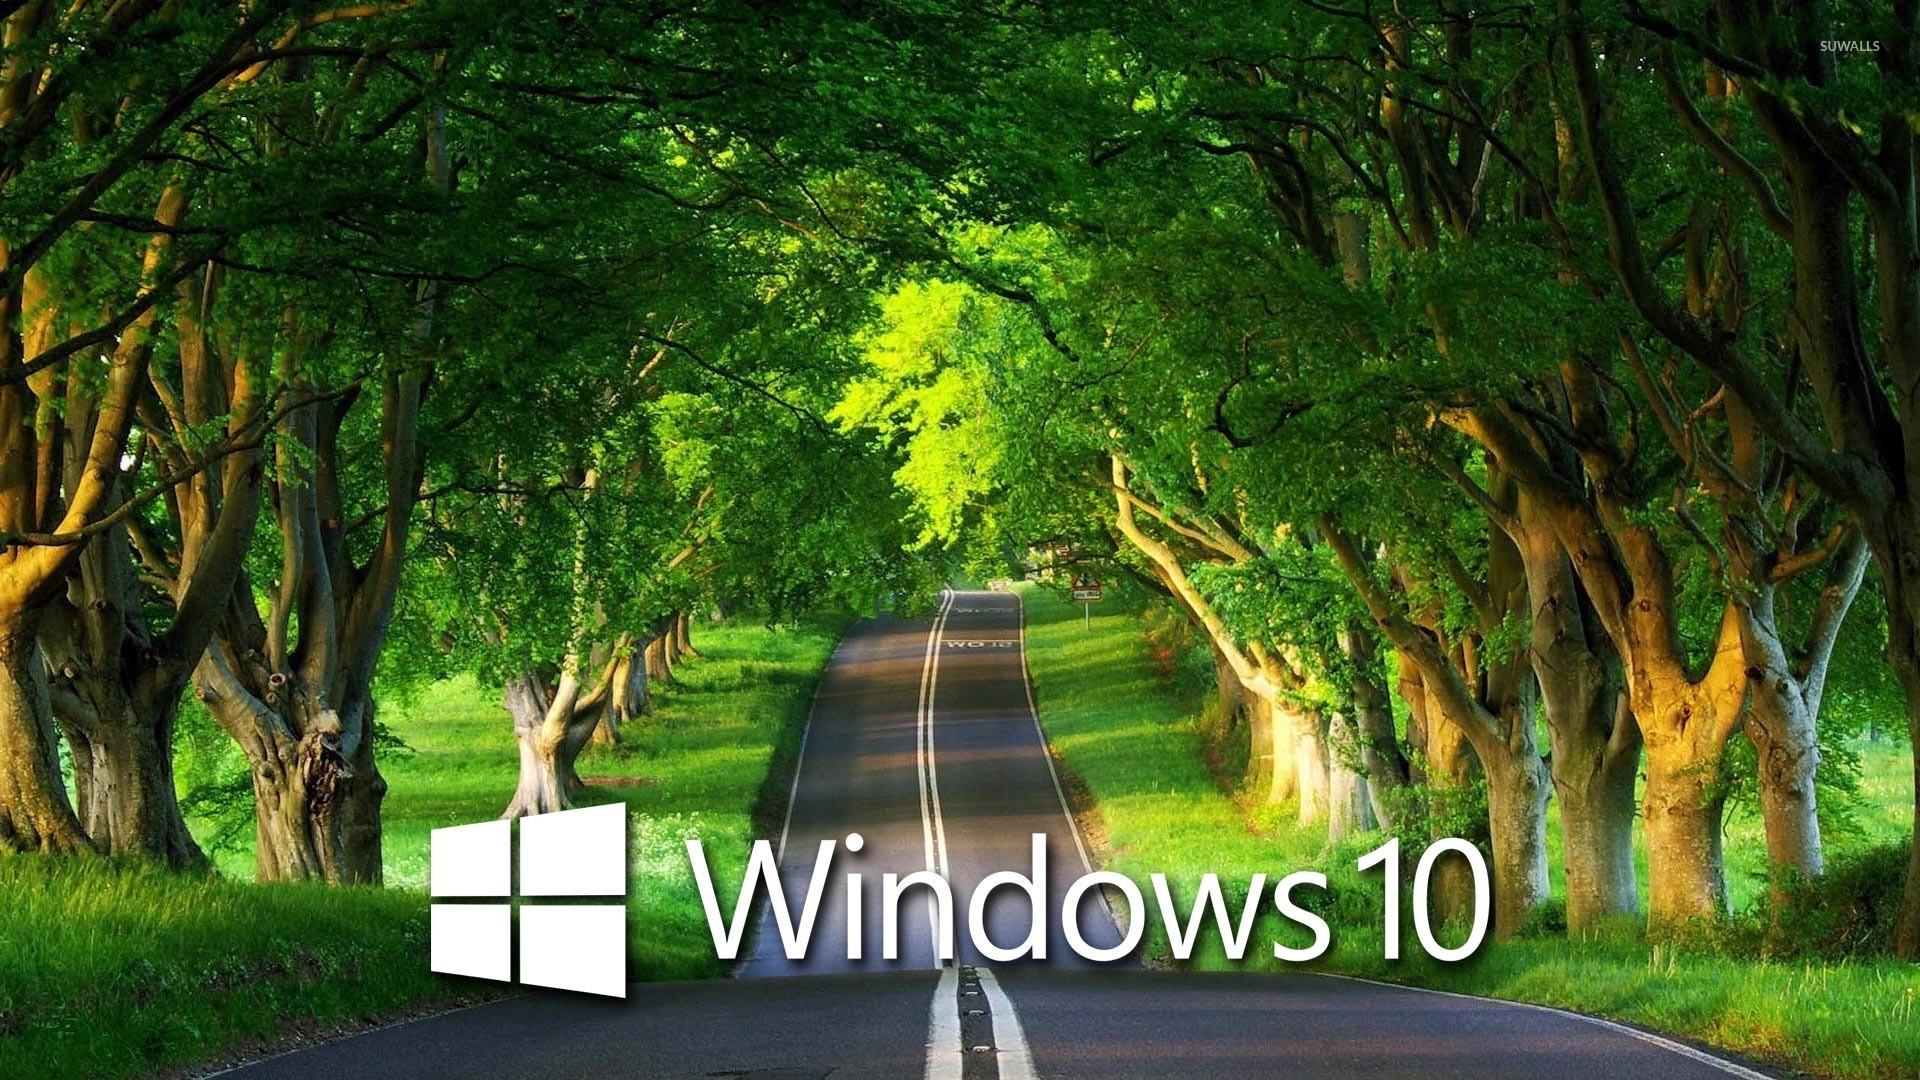 Windows 10 Wallpaper 1920x1080 (75+ Images